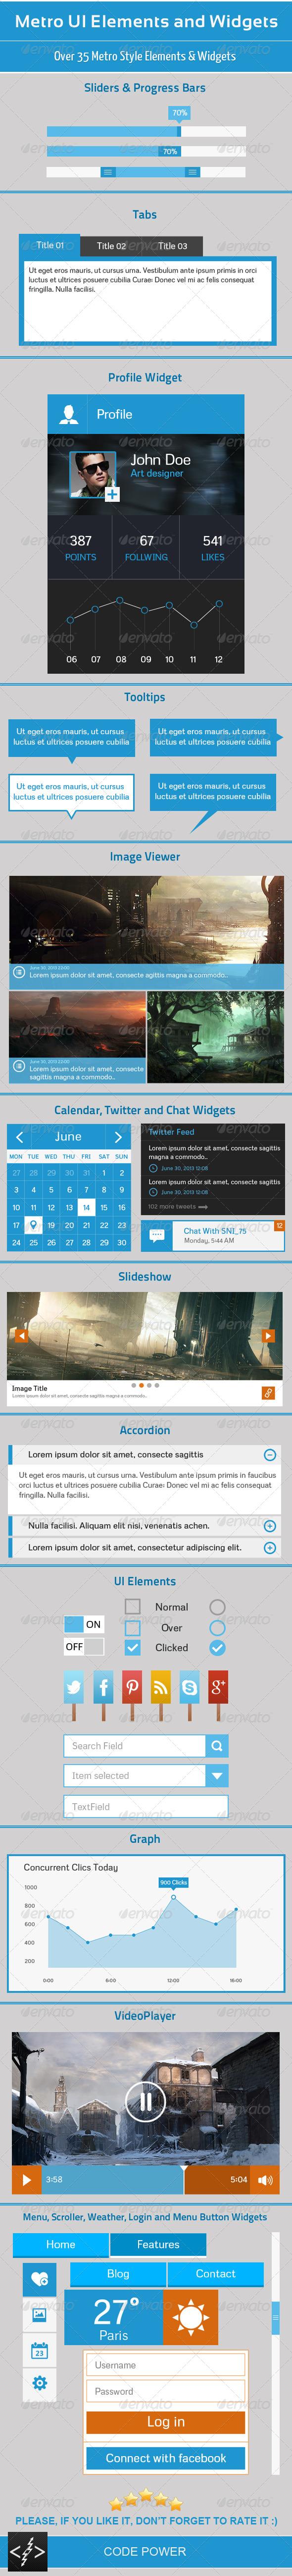 GraphicRiver Metro UI Elements and Widgets 4501754